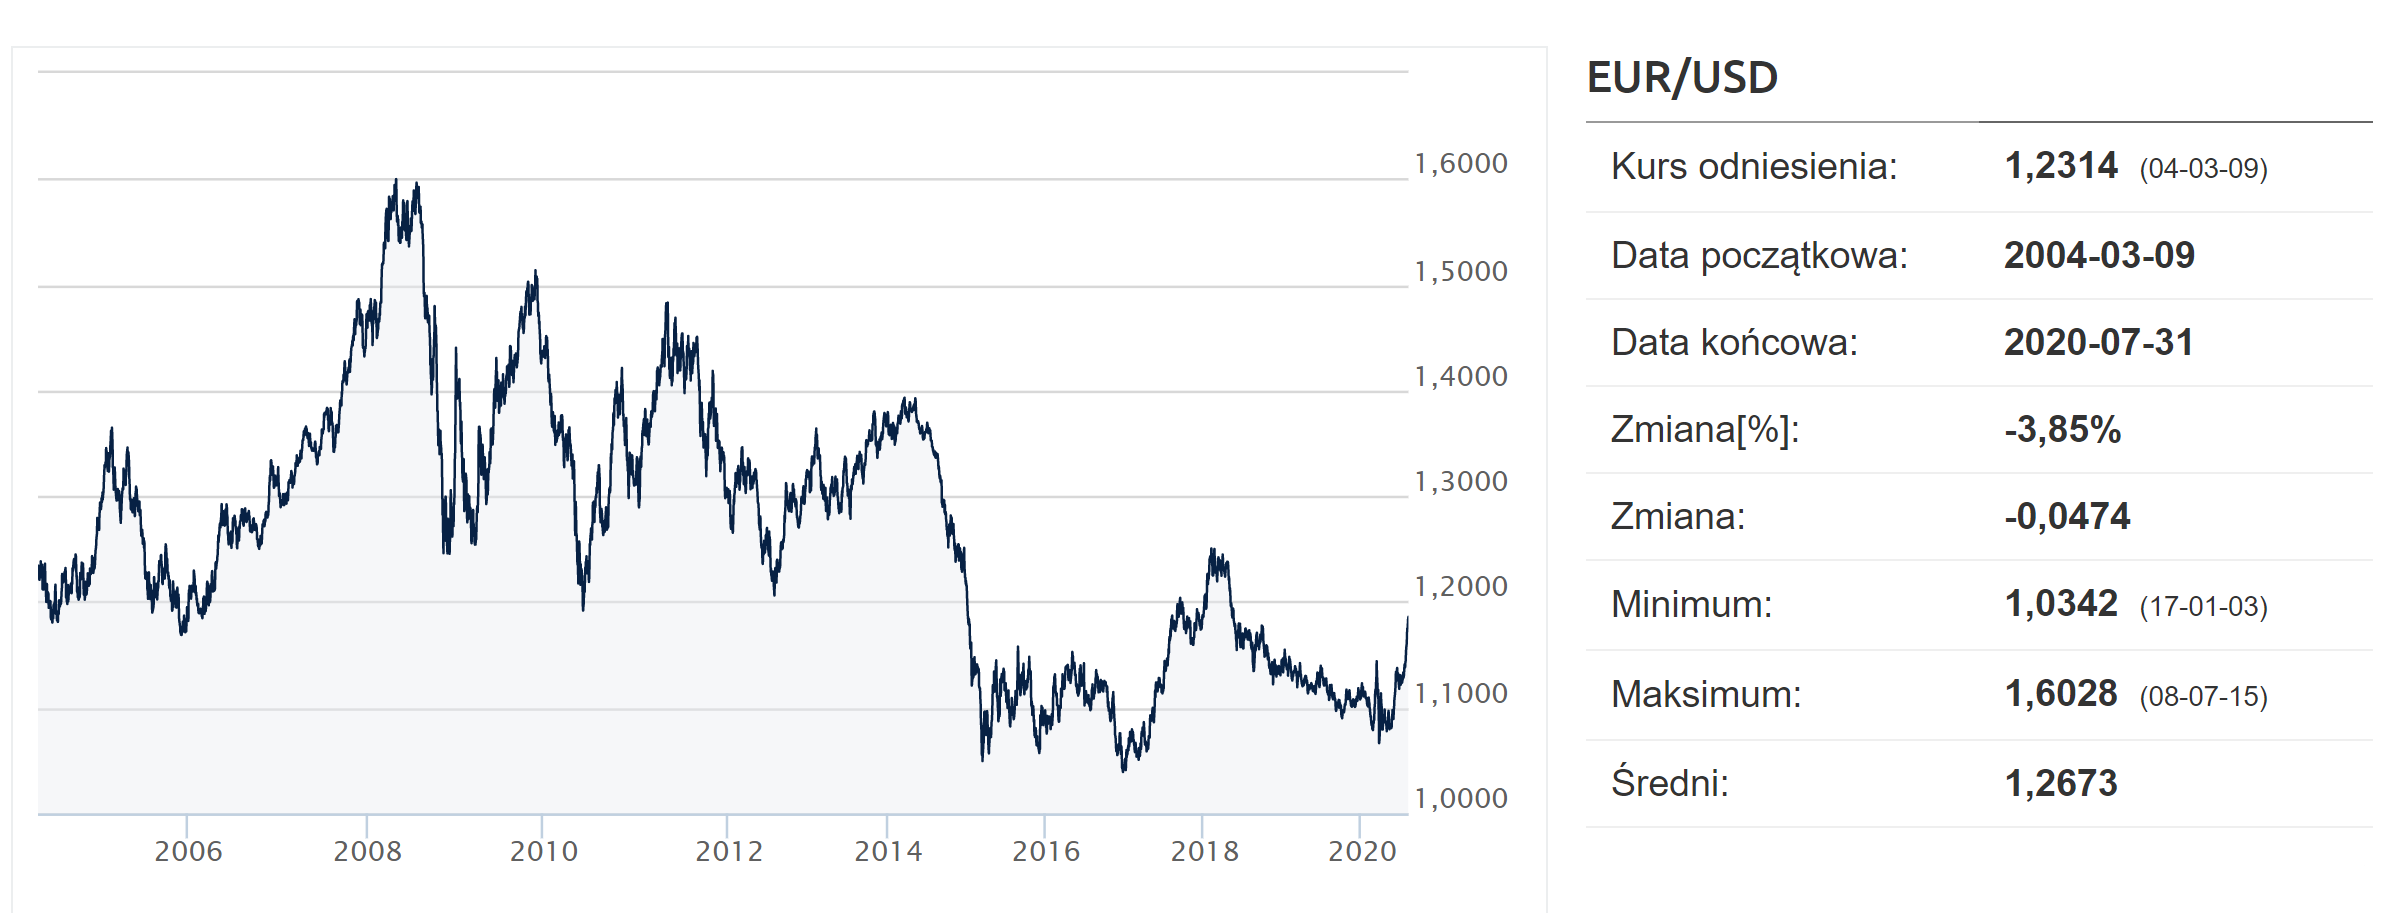 kurs eur-usd - euro dolar -2006-2020 - historyczny kurs-ekantor-pl